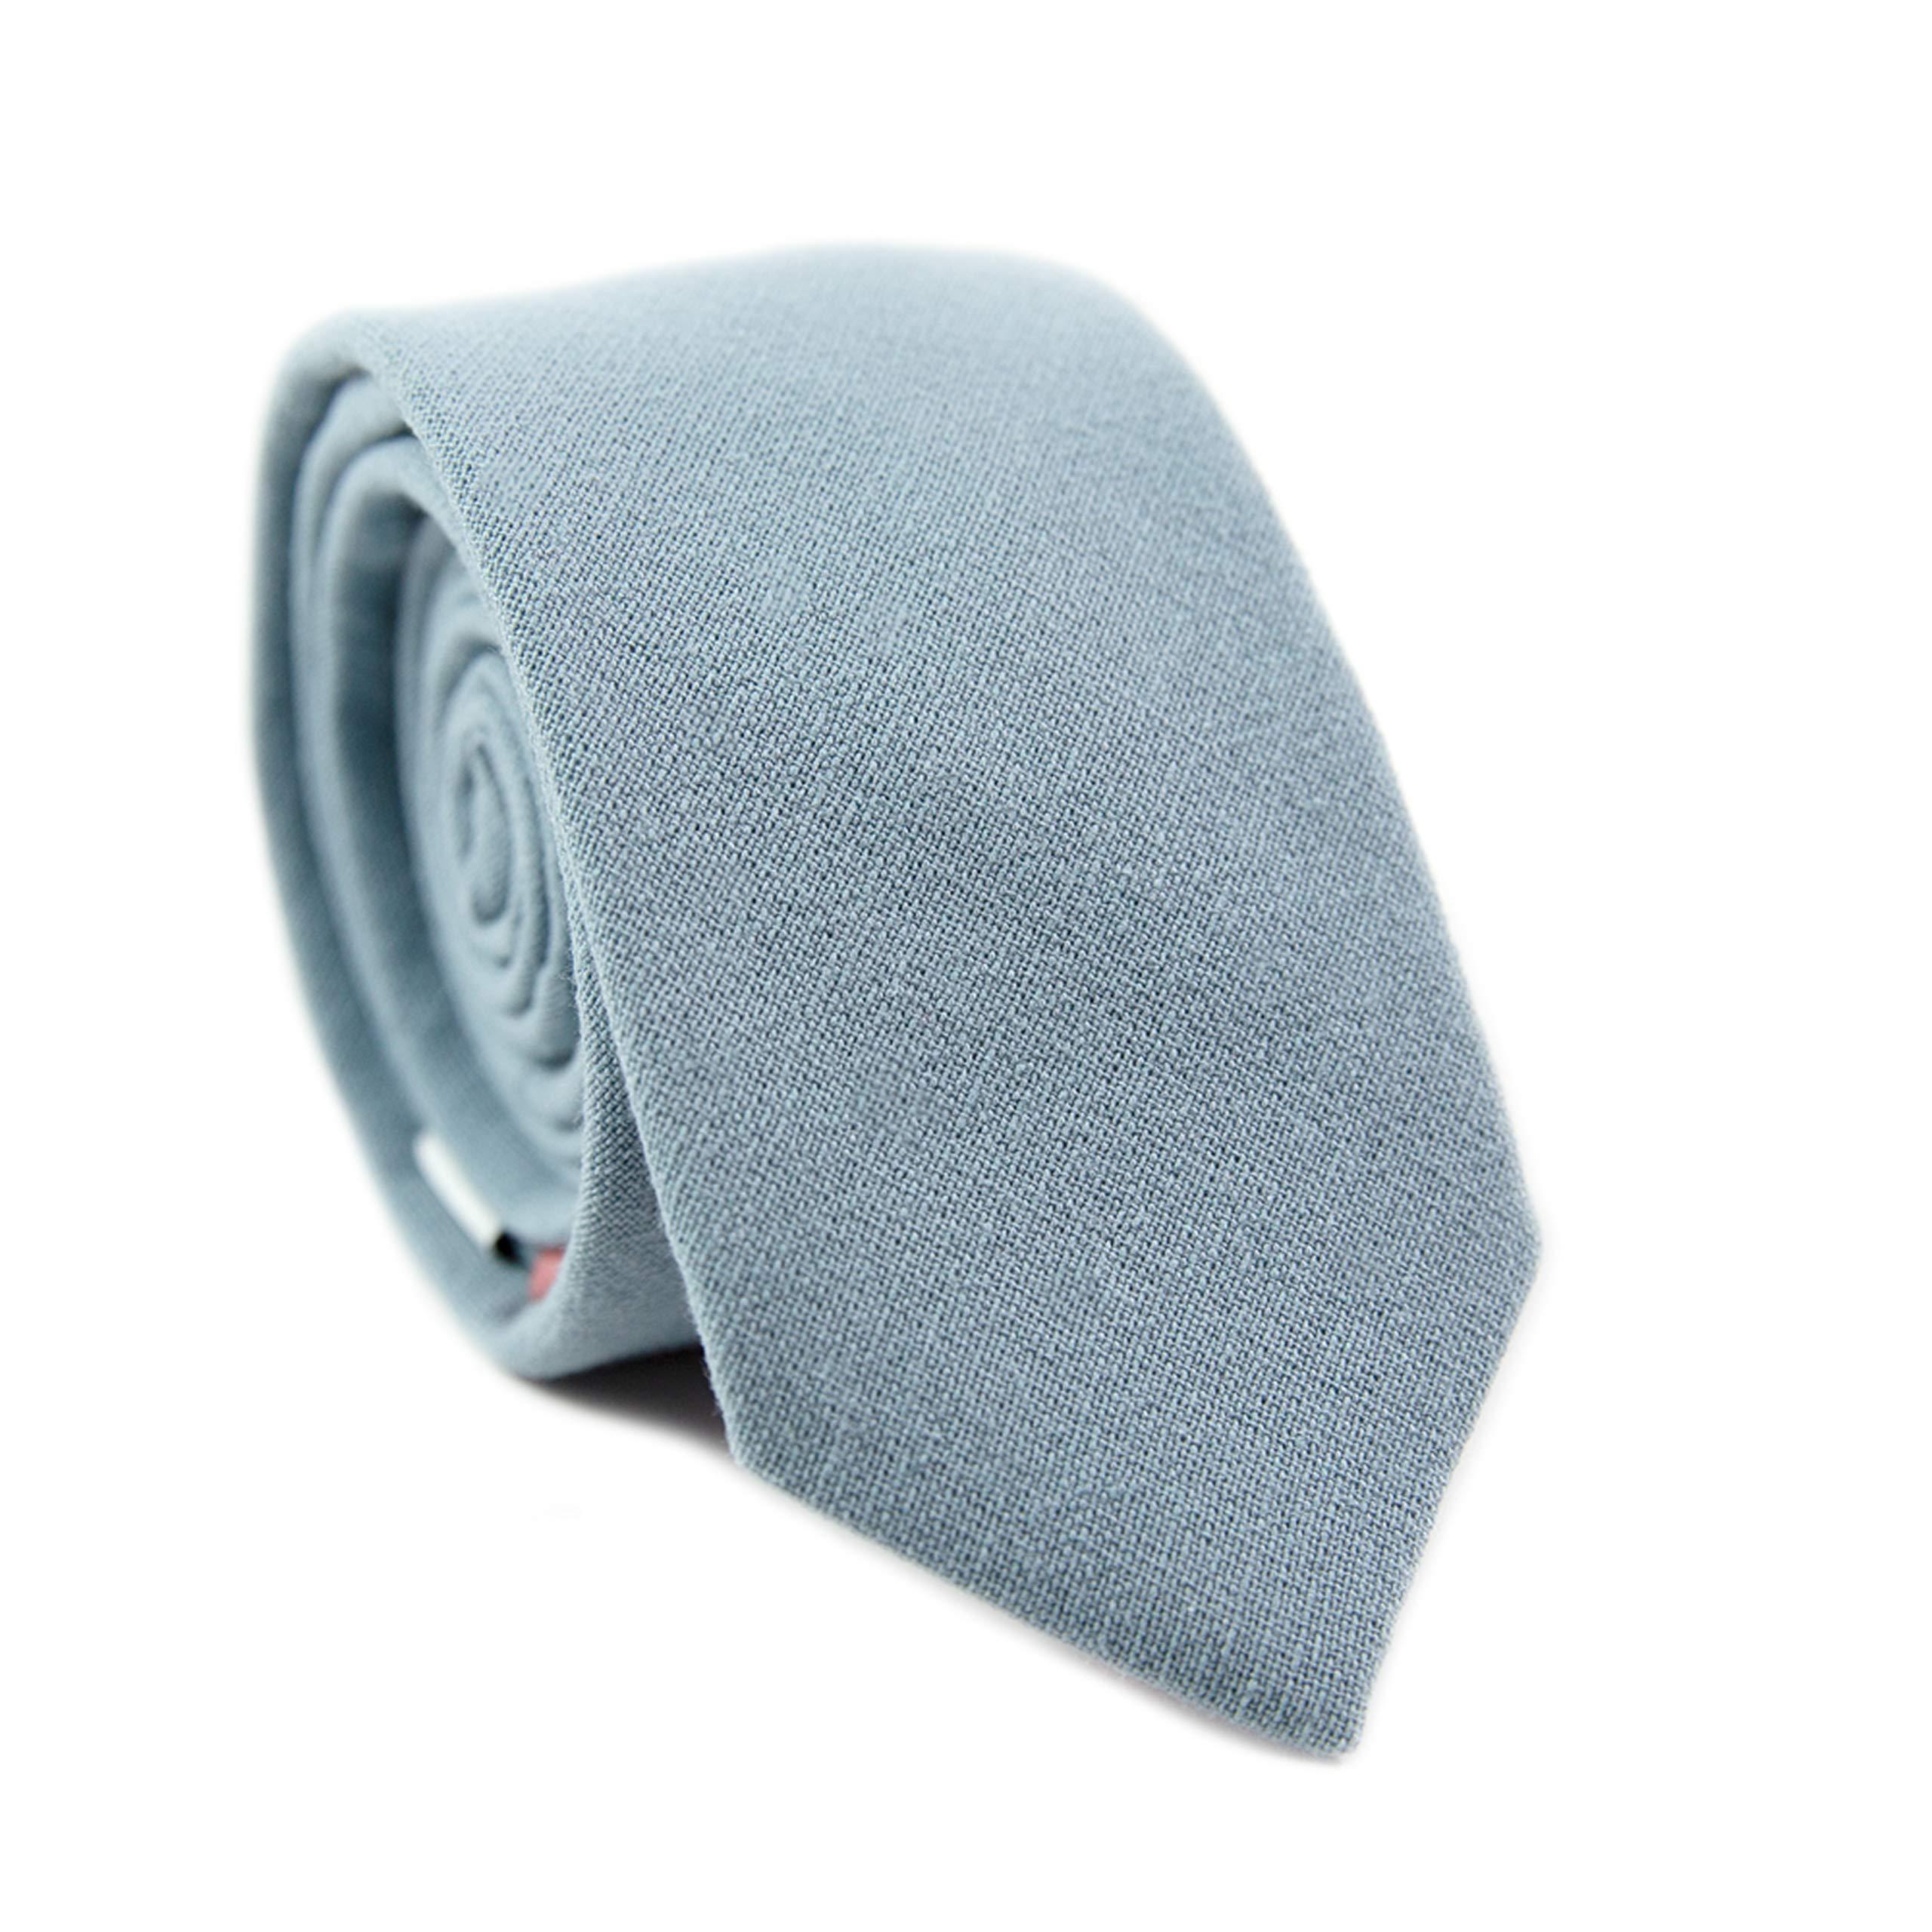 DAZI Men's Skinny Tie, Cotton Wool Linen Necktie, Great for Weddings, Groom, Groomsmen, Missions, Dances, Gifts. (Dusty)